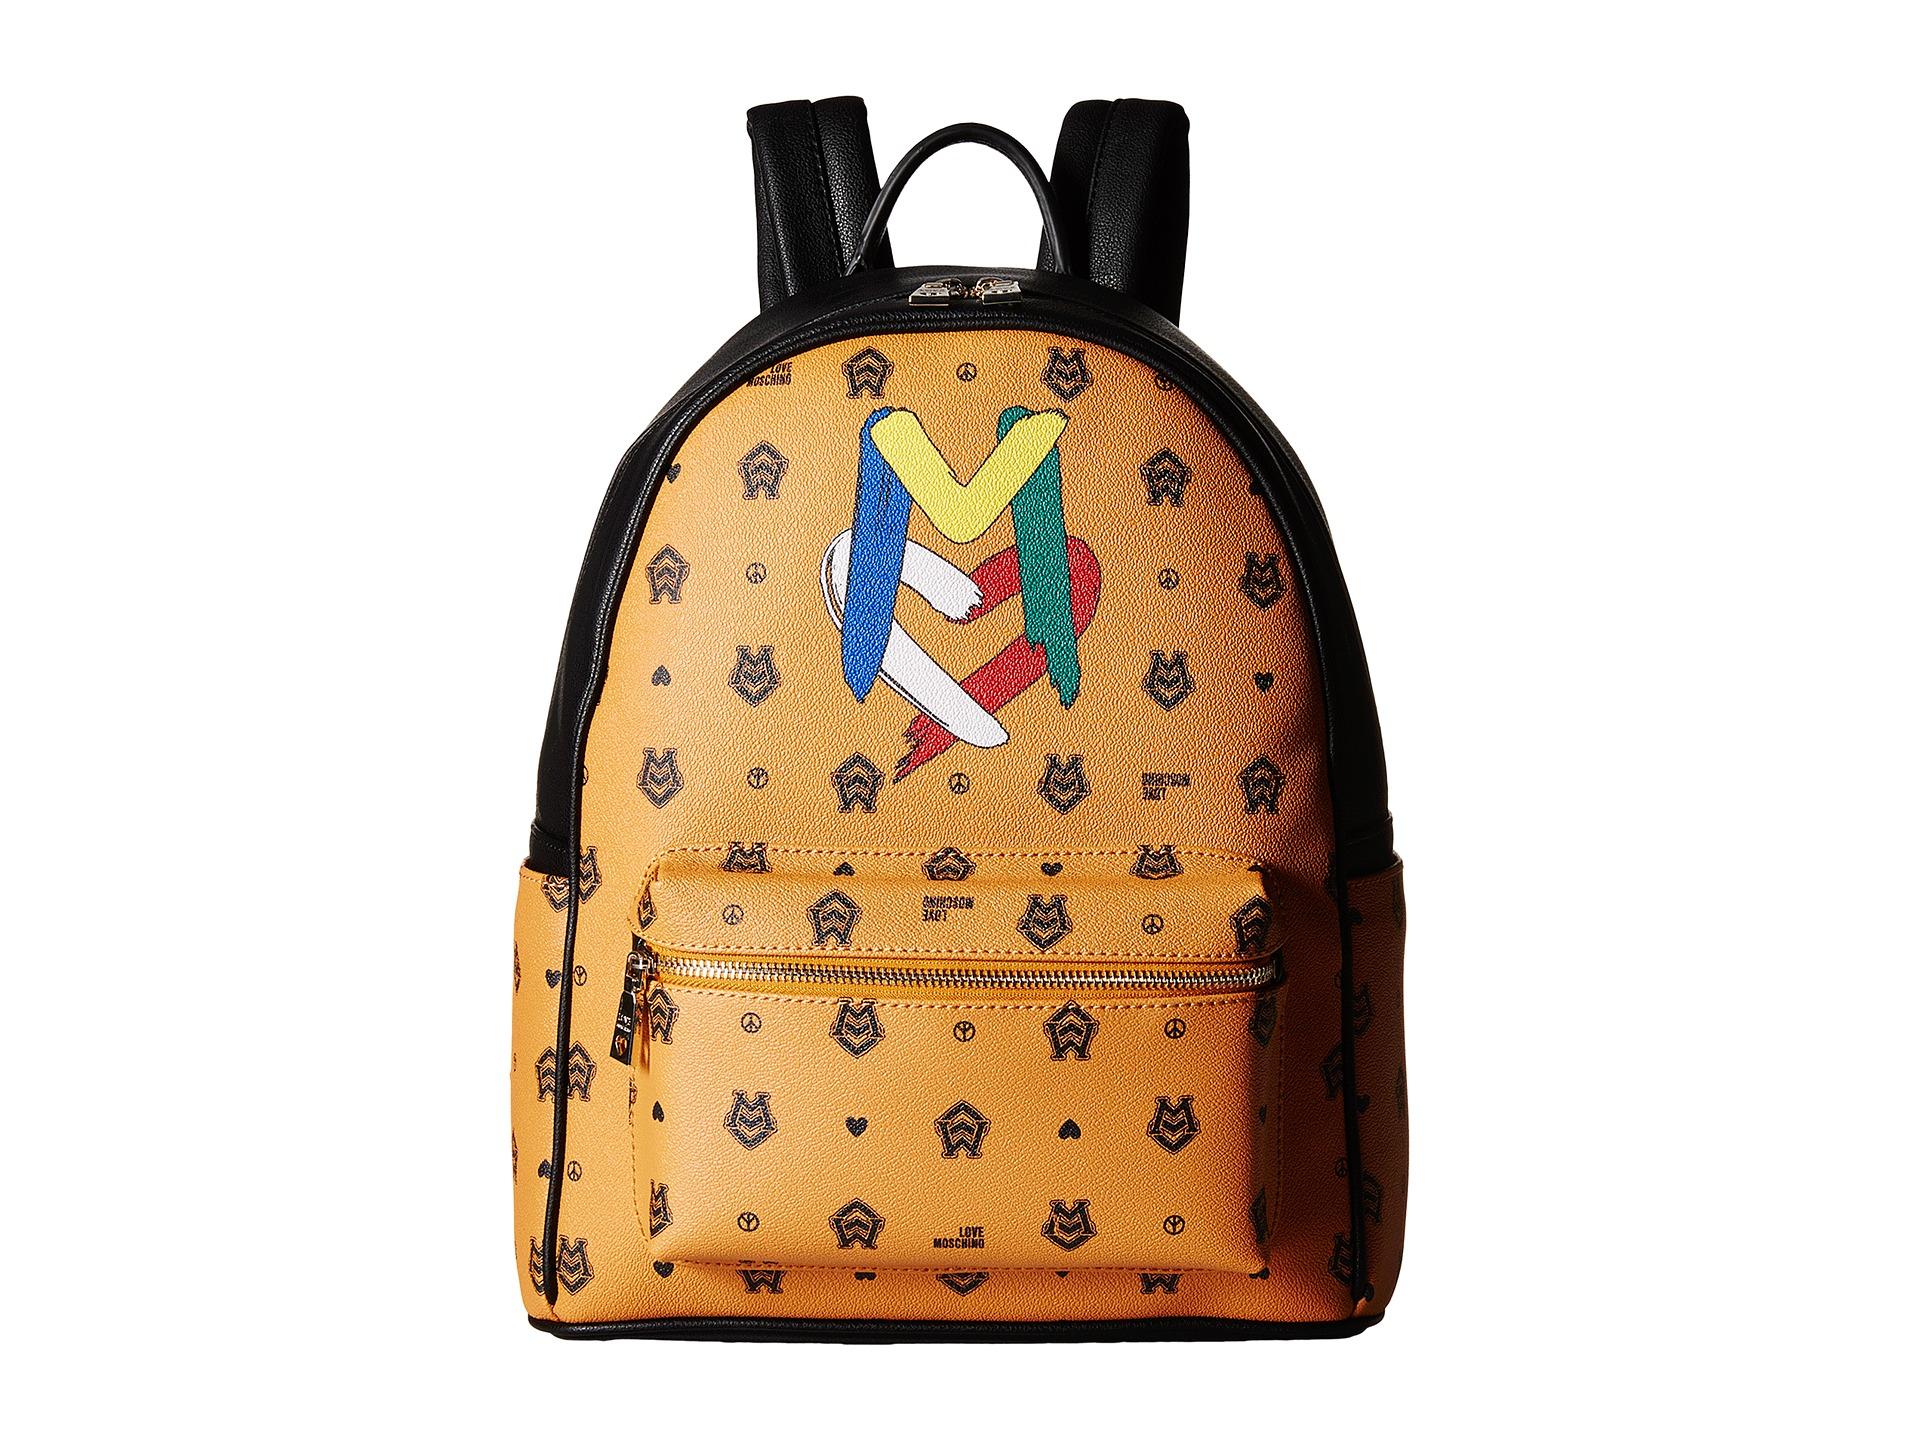 639d4b35ef Love Moschino Monogram Backpack in Orange - Lyst